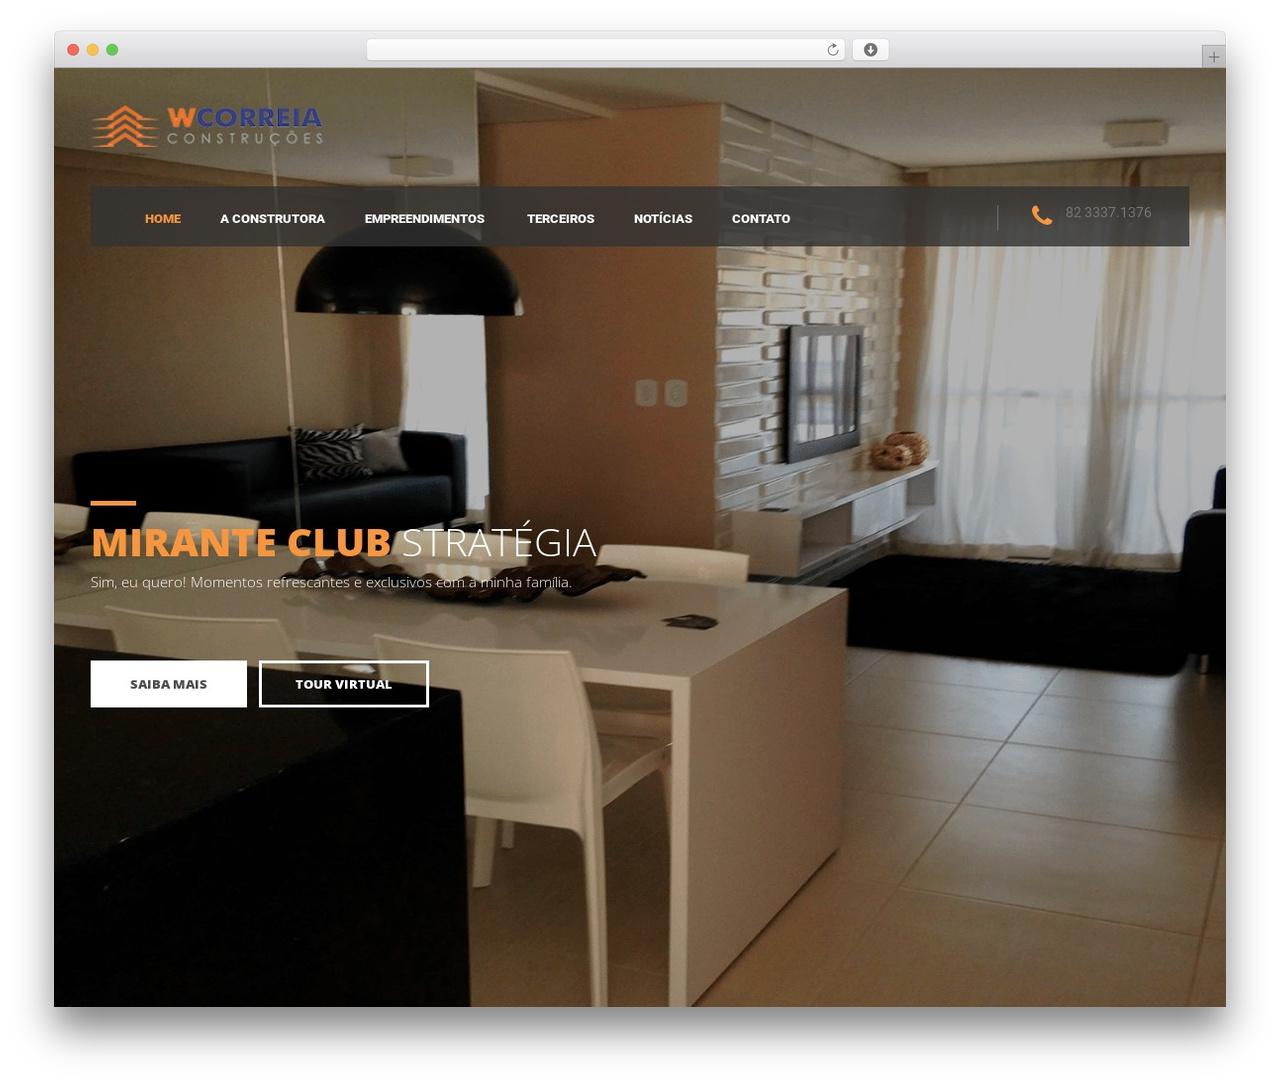 Template WordPress BestBuild - wcorreia.com.br